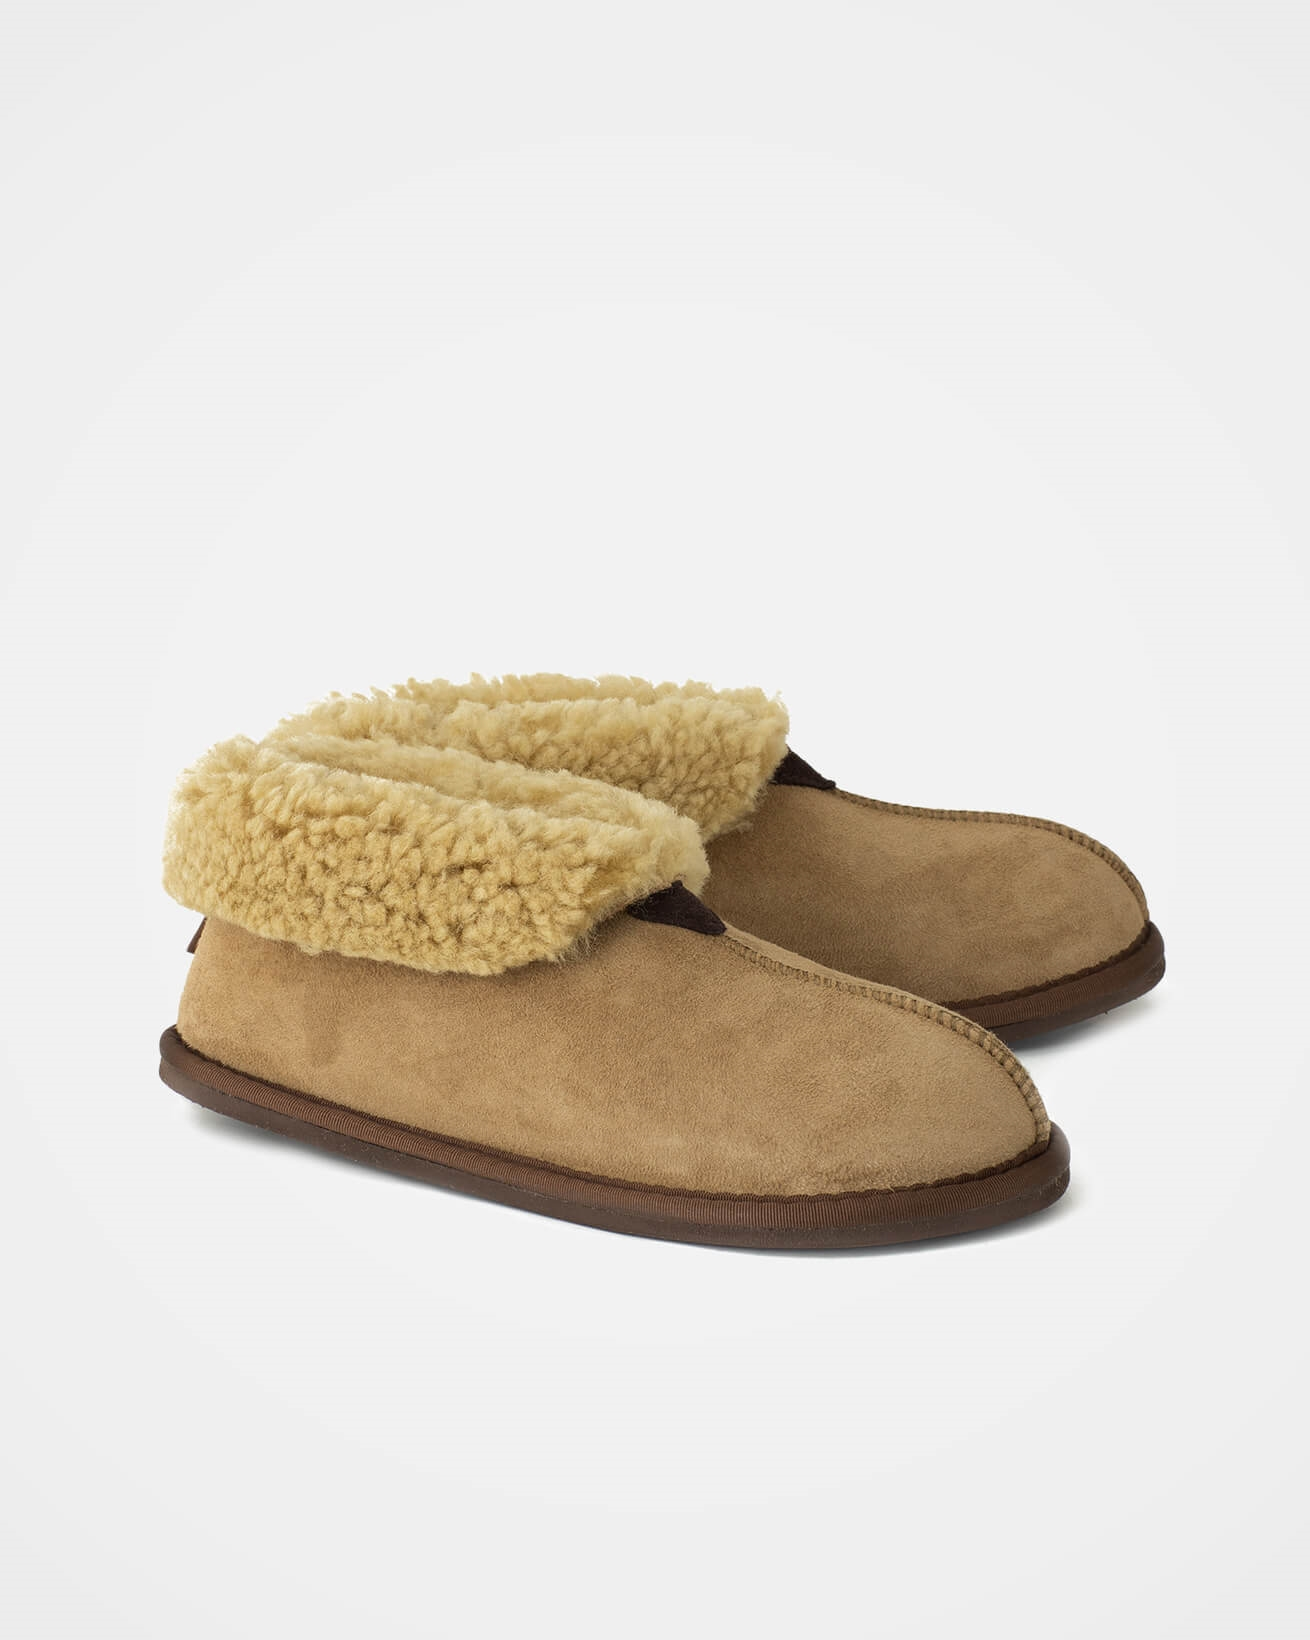 Ladies Sheepskin Bootee Slipper - Size 5 - Teddy - 1631